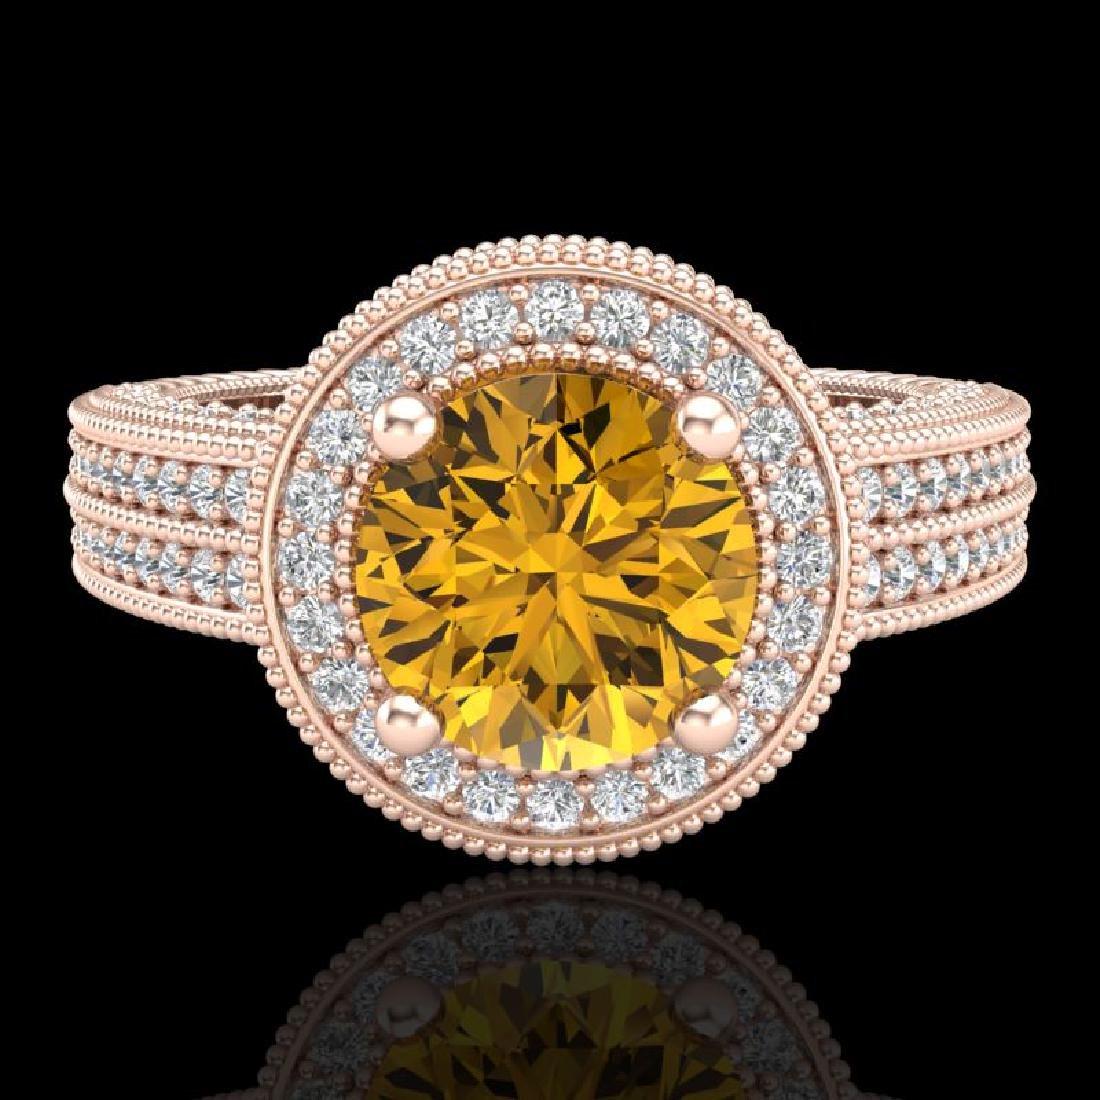 2.8 CTW Intense Fancy Yellow Diamond Engagement Art - 2